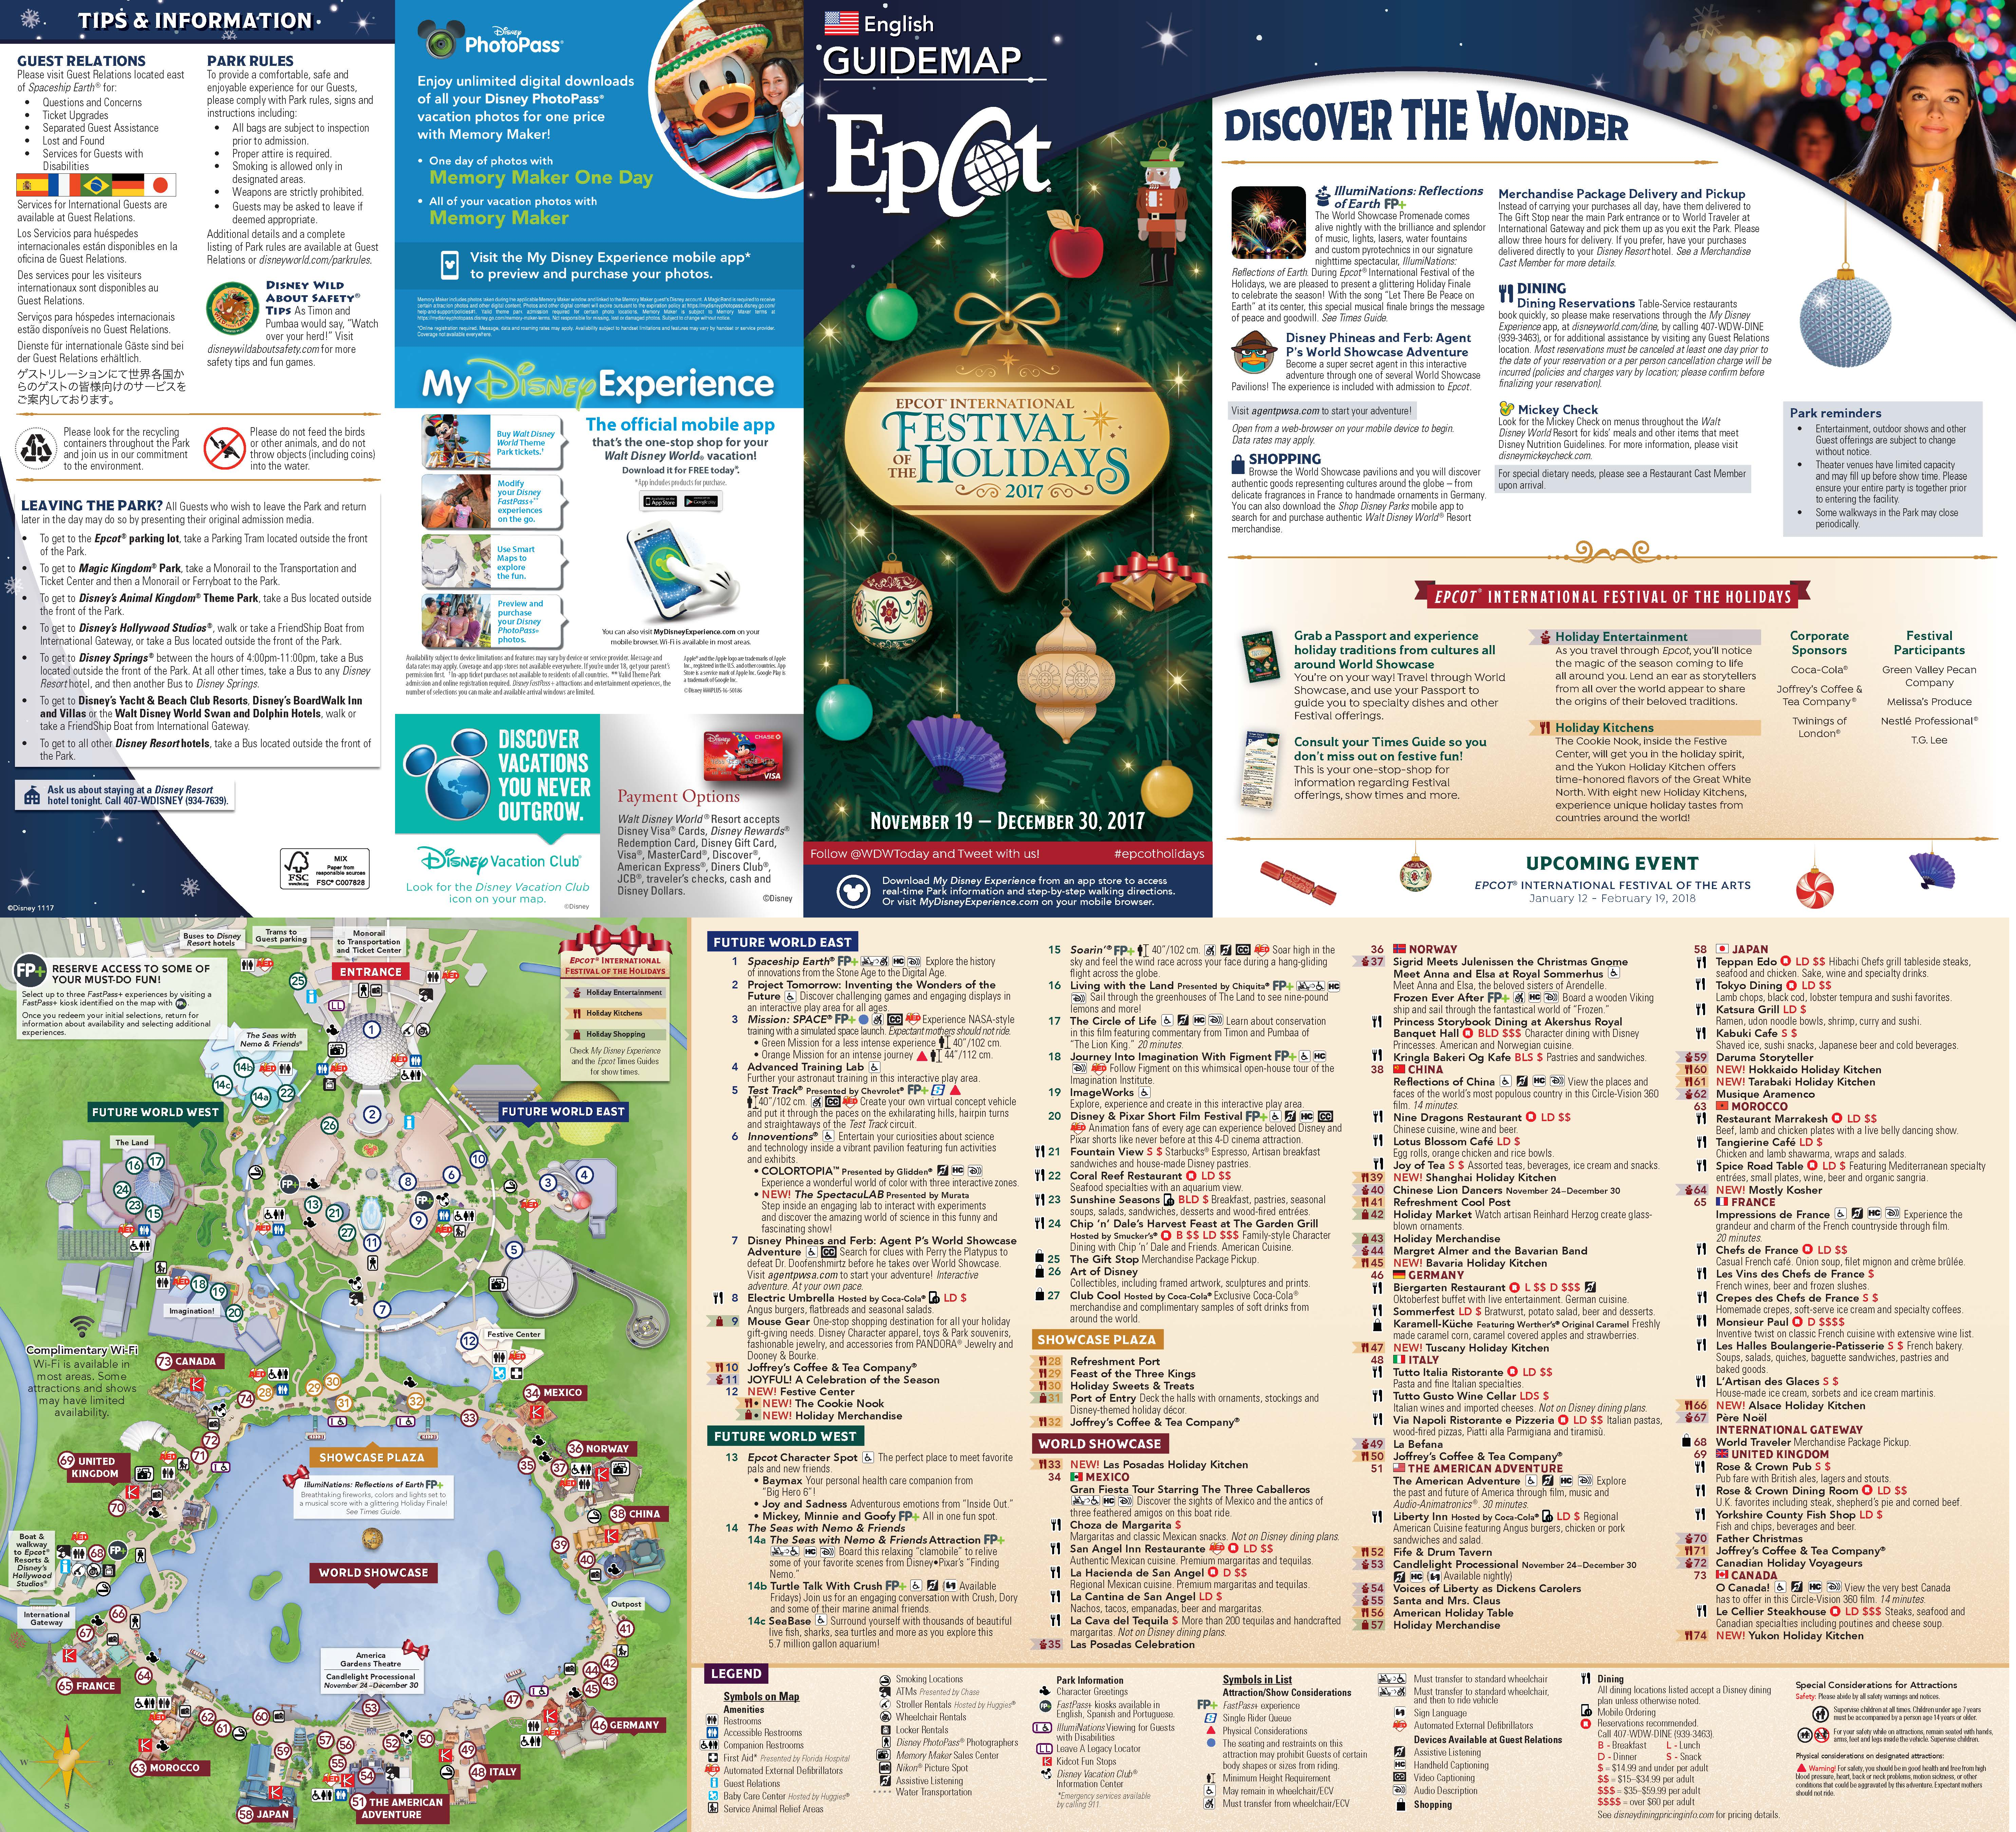 Disney World Maps • WDW Travels